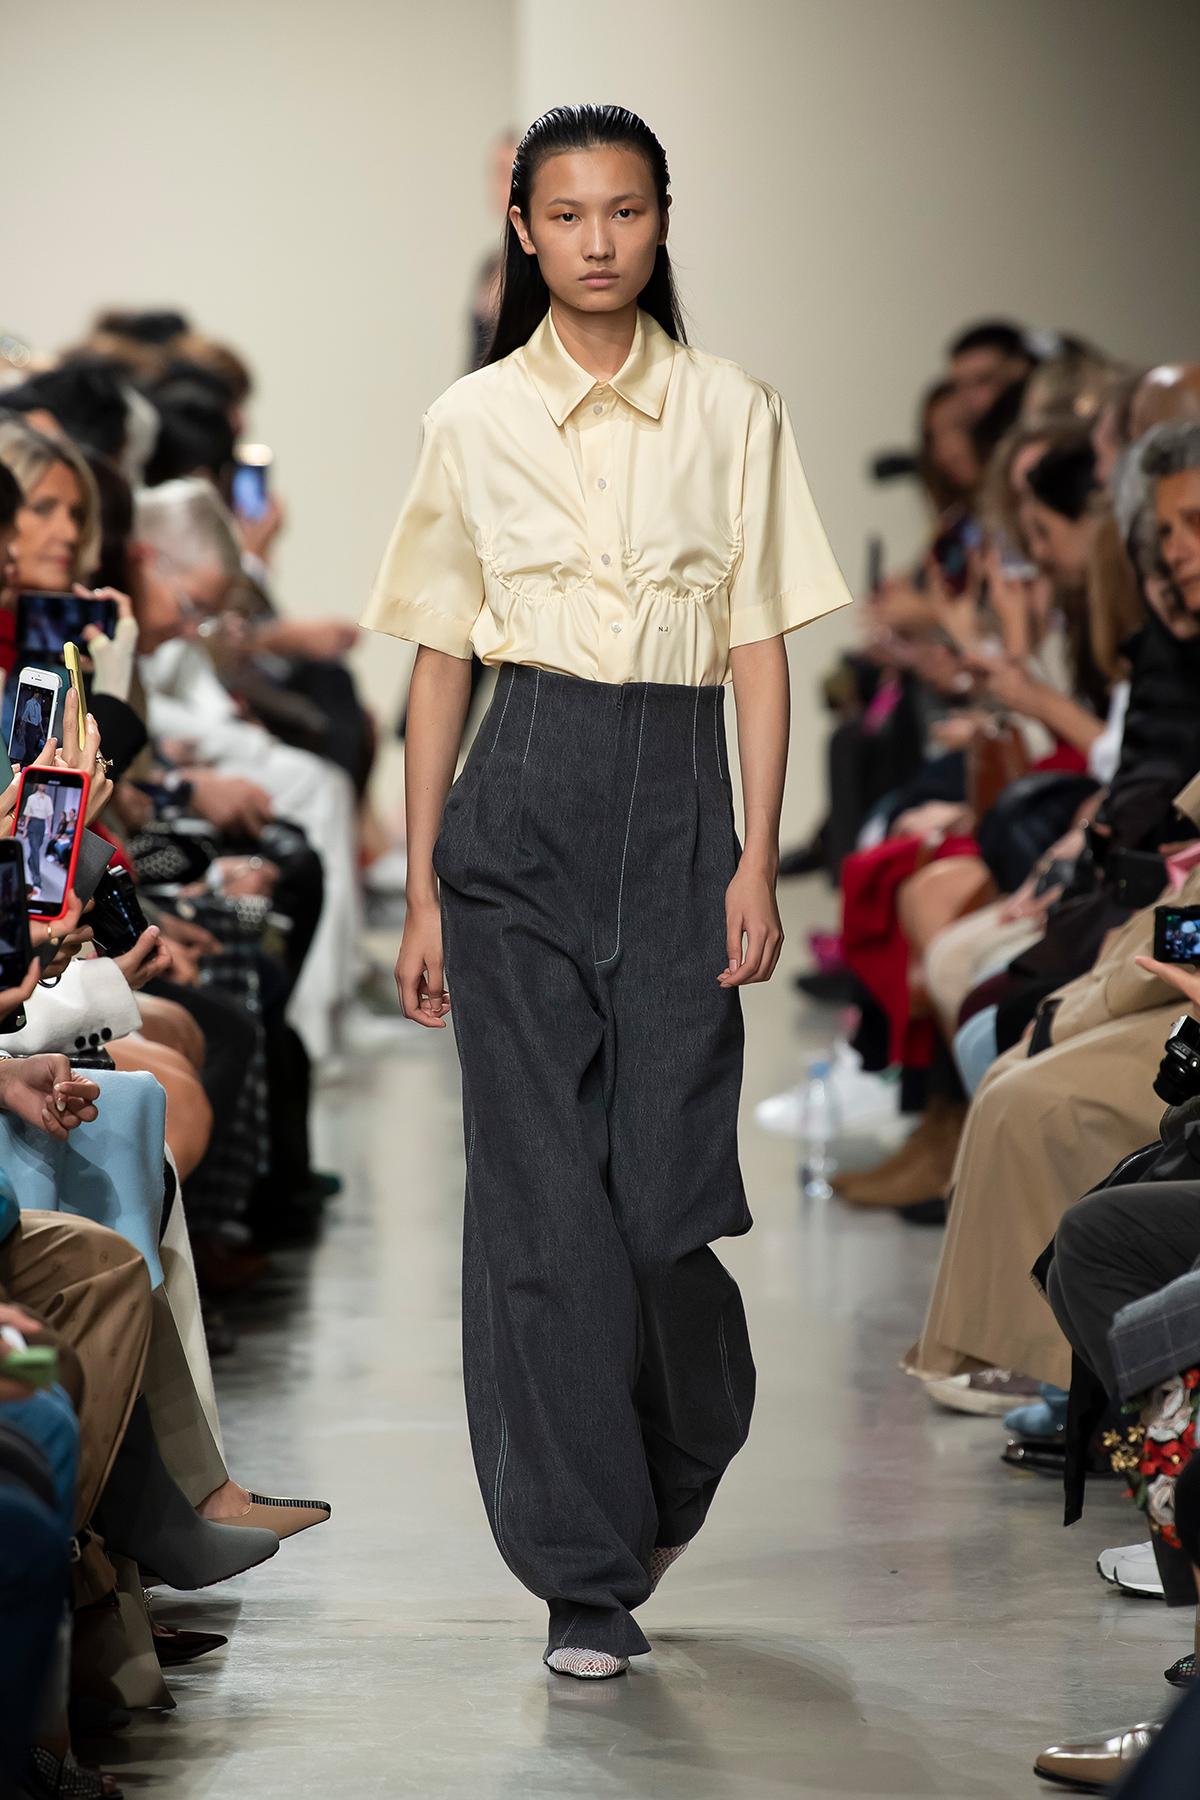 LOOK 2 Shirt PERRETTE Trousers POE